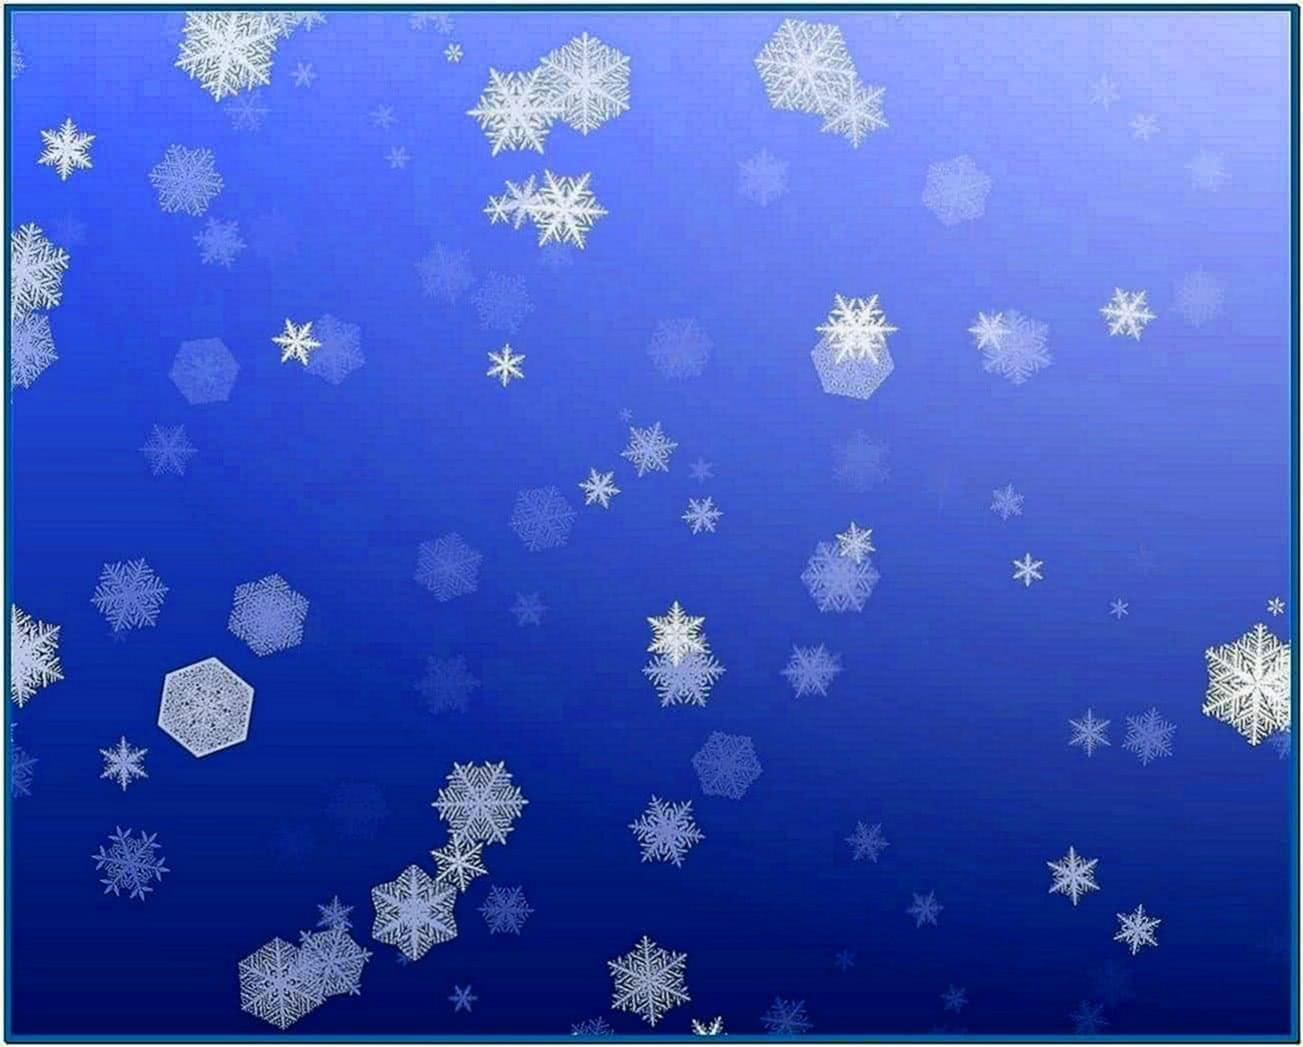 Lotsa snow screensaver mac - Download free